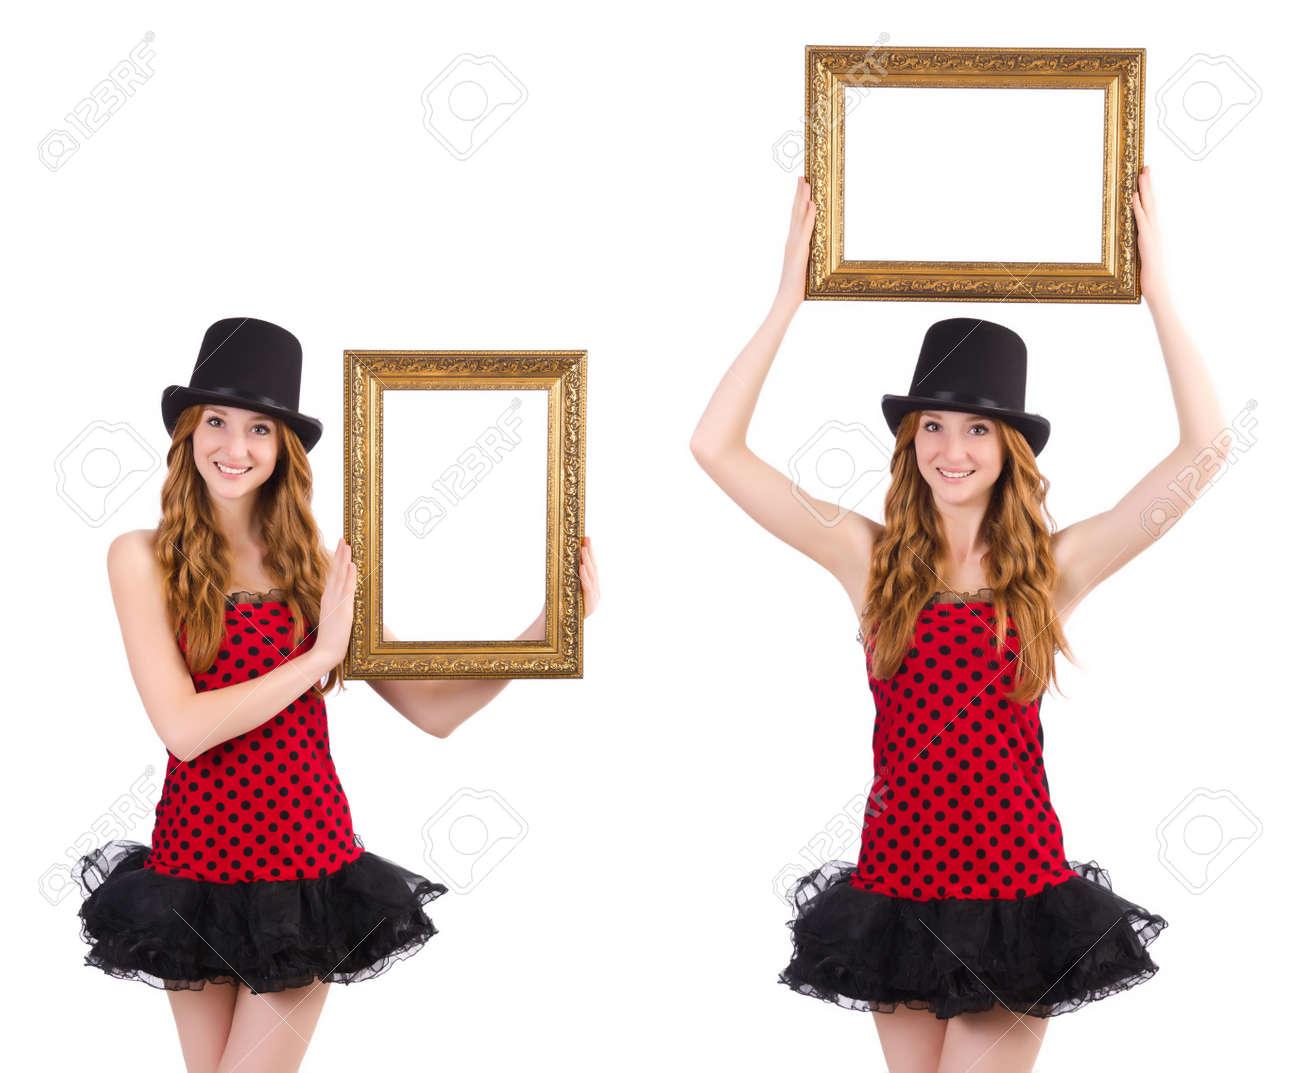 Berühmt Hübschen Bilderrahmen Fotos - Benutzerdefinierte ...